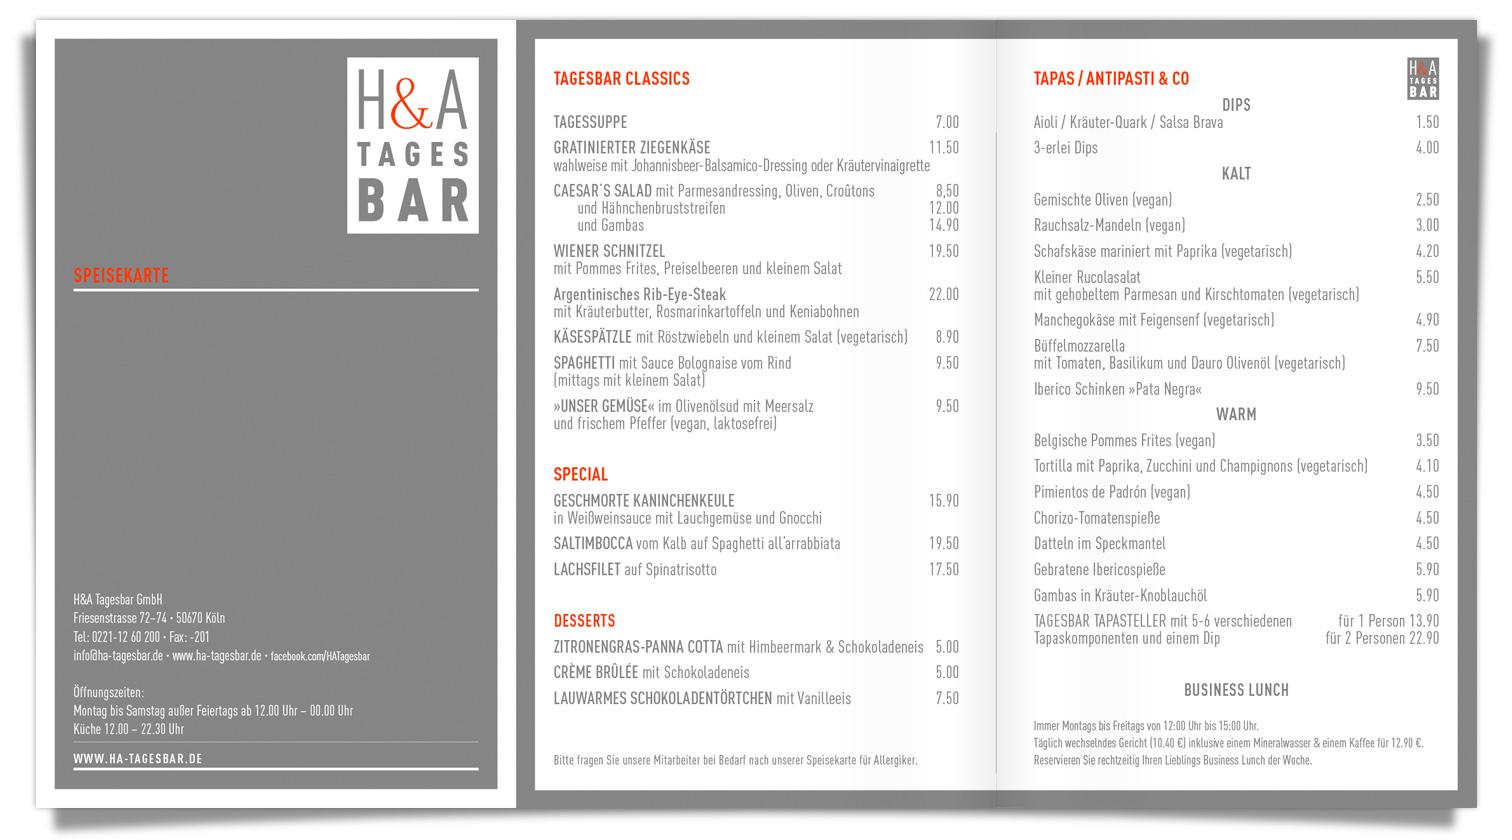 H&A TAGESBAR Speisekarte , Pimientos de Padrón, Chorizo, Ibericospieße, Manchegokäse